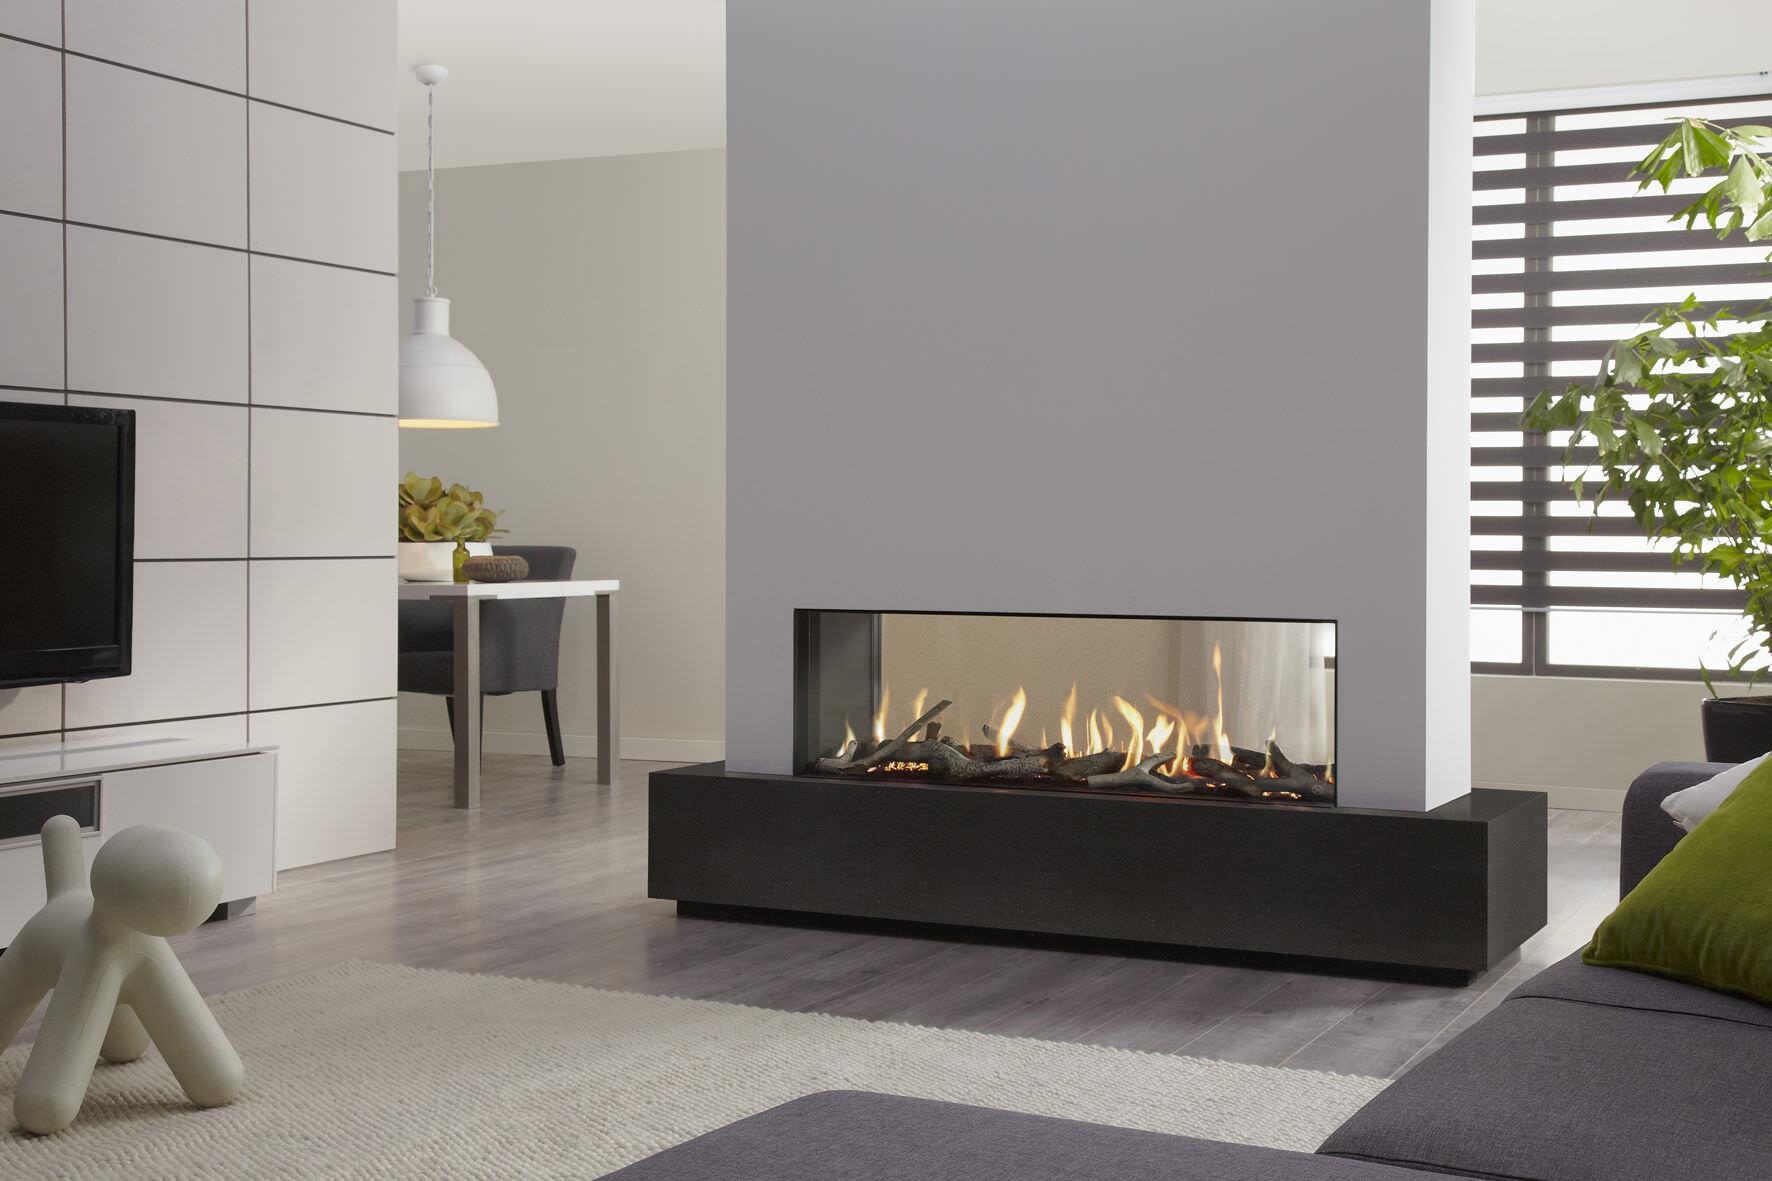 36 Inch Wifi Intelligent Smart Electric Bioethanol Fireplace